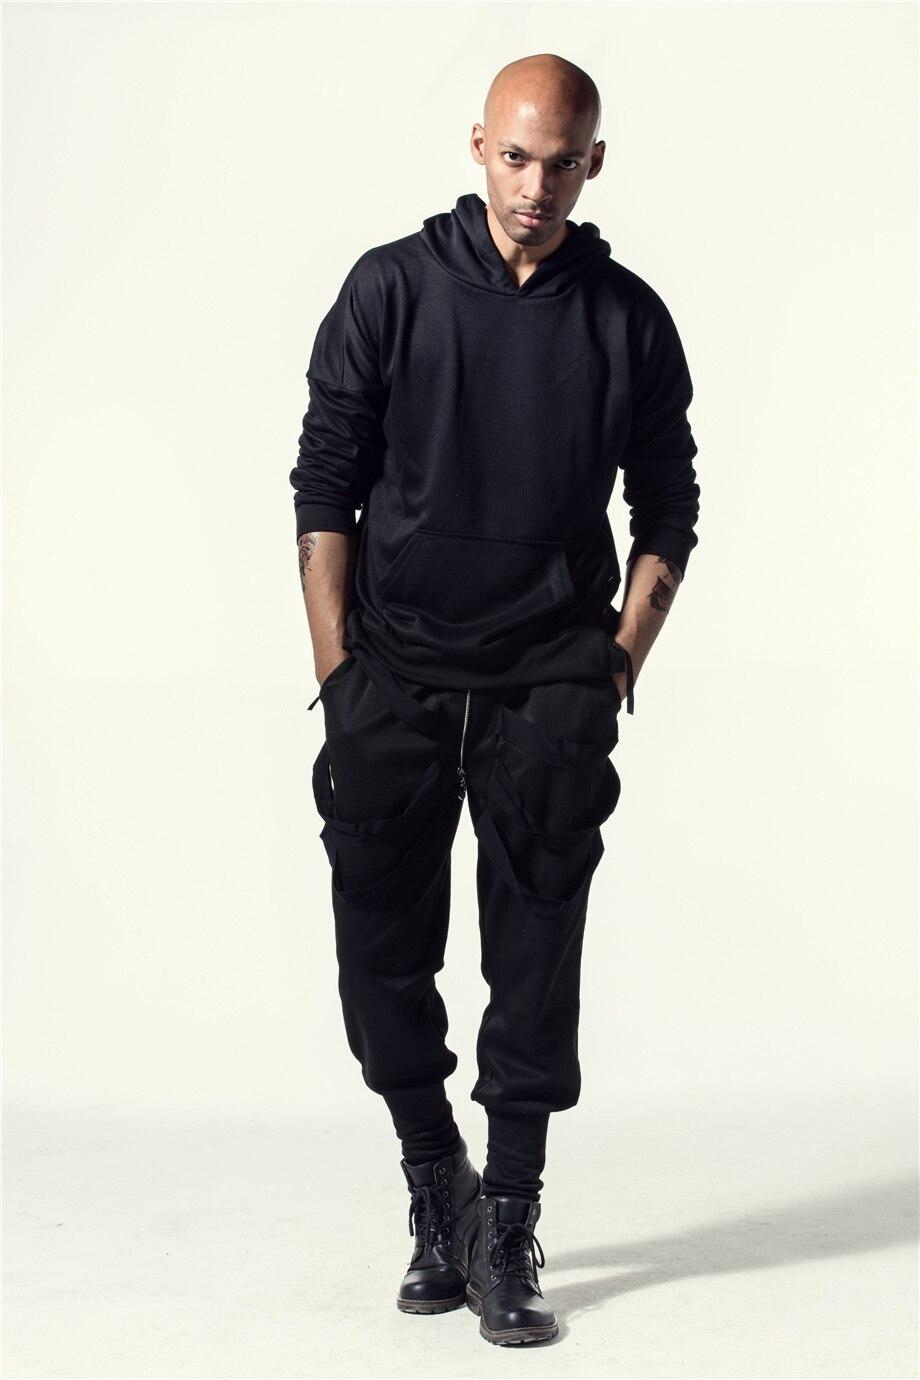 Una Reta Brand New Design Hoodie Men Fashion Sweatshirts Bandage Design Hip-Hop Style Plus Size M-5XL Pullover Sweatshirts Men 6